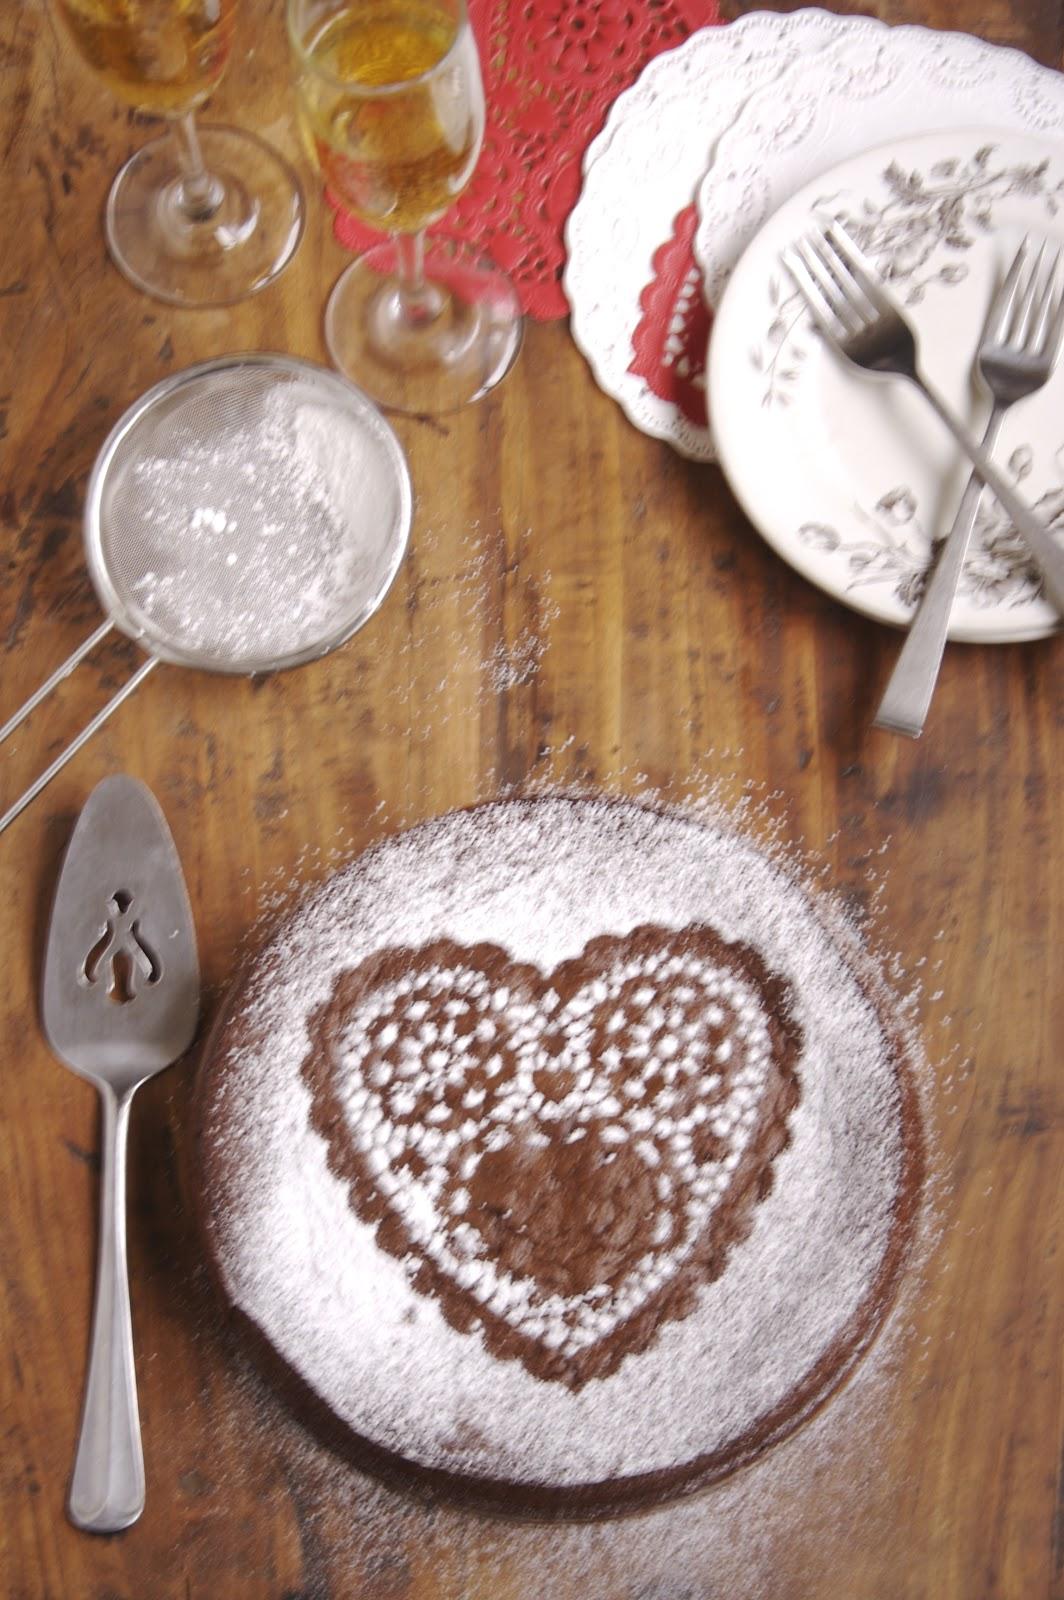 Flourless chocolate cake. A rich and fudgy dessert!